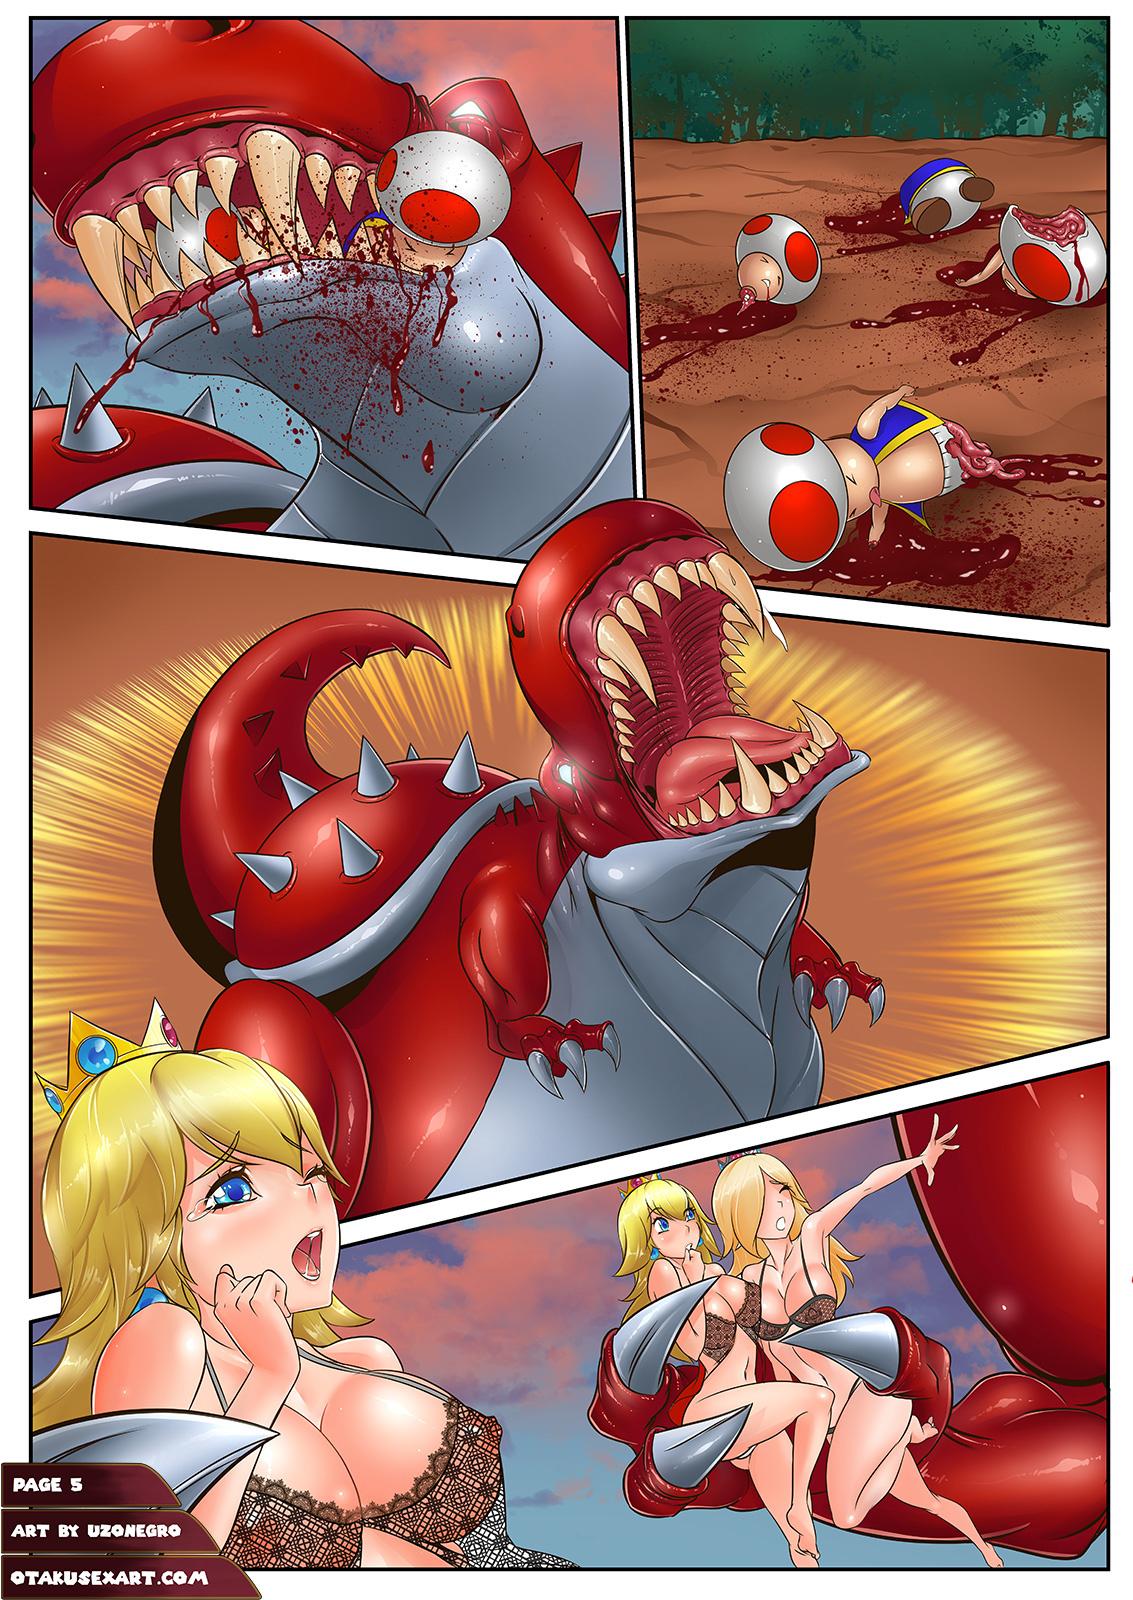 Two Princesses One Yoshi 2 porn comics Oral sex, Bestiality, Blowjob, Creampie, Cum Shots, Double Penetration, Group Sex, Hardcore, Masturbation, Rape, Straight, Titfuck, X-Ray